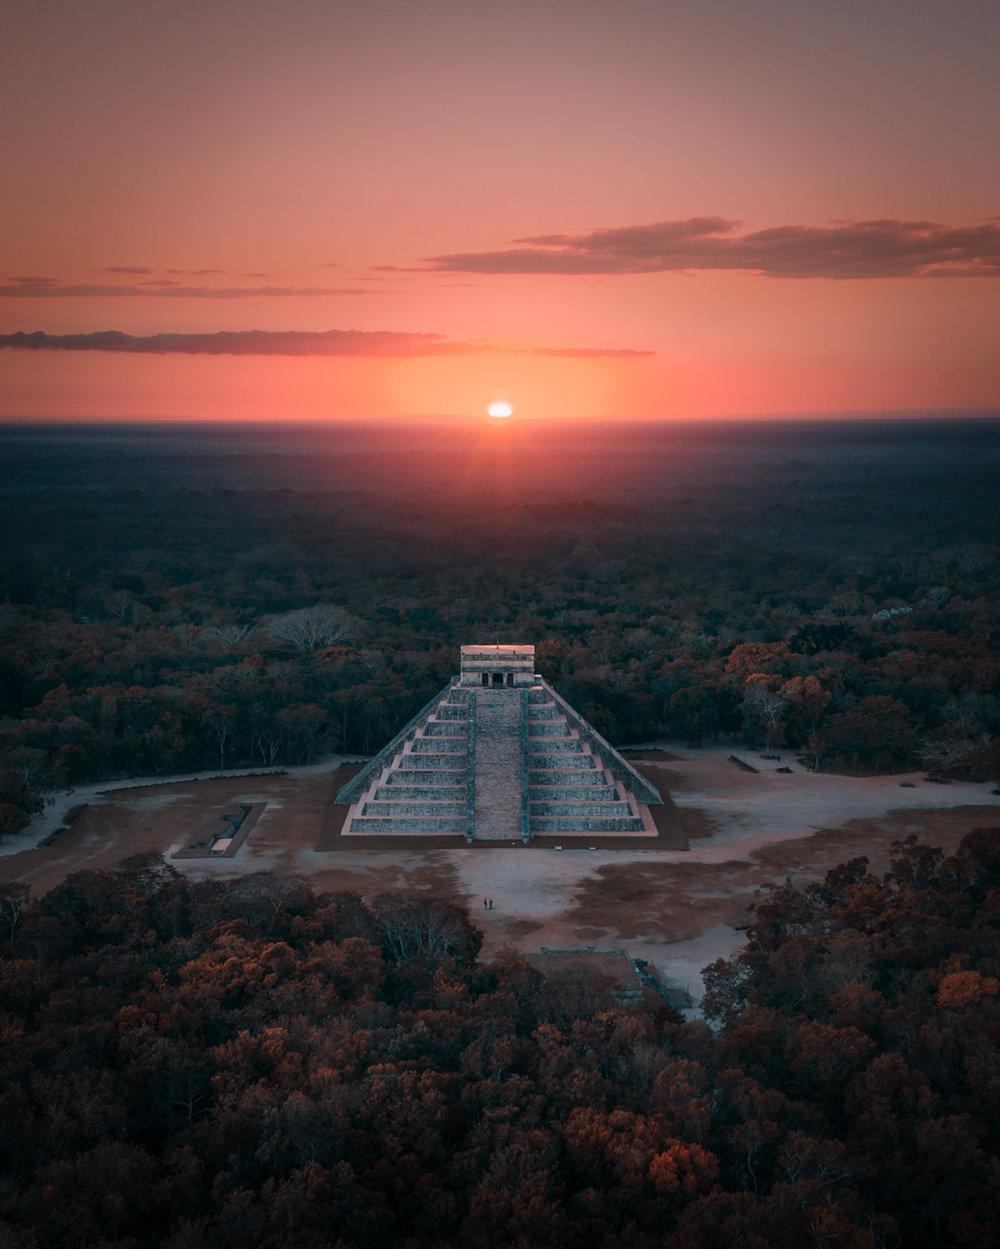 Mexico From Above Aerial Photography Series By Dimitar Karanikolov 1